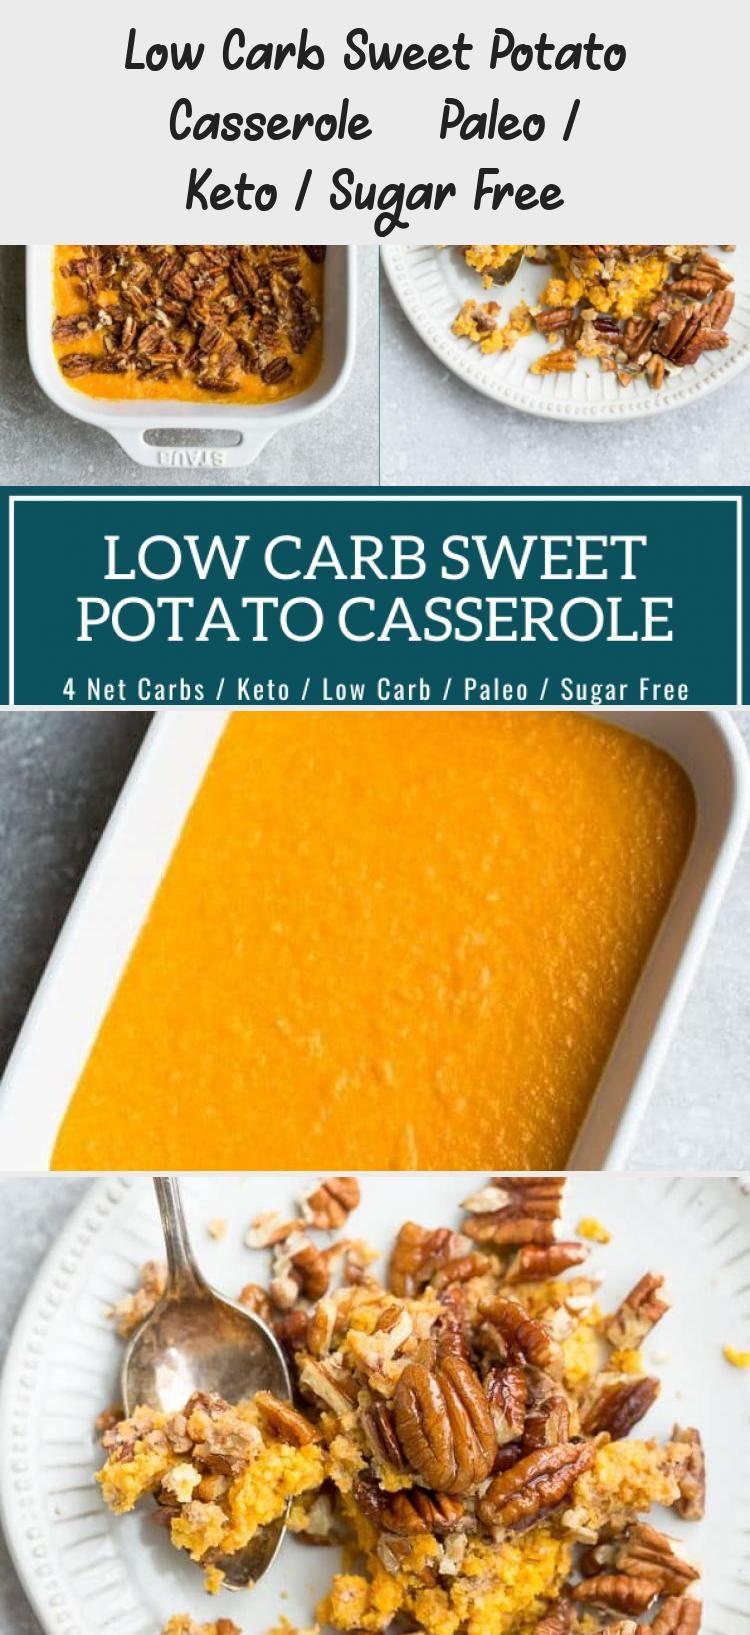 Low Carb Sweet Potato Casserole Paleo Keto Sugar Free